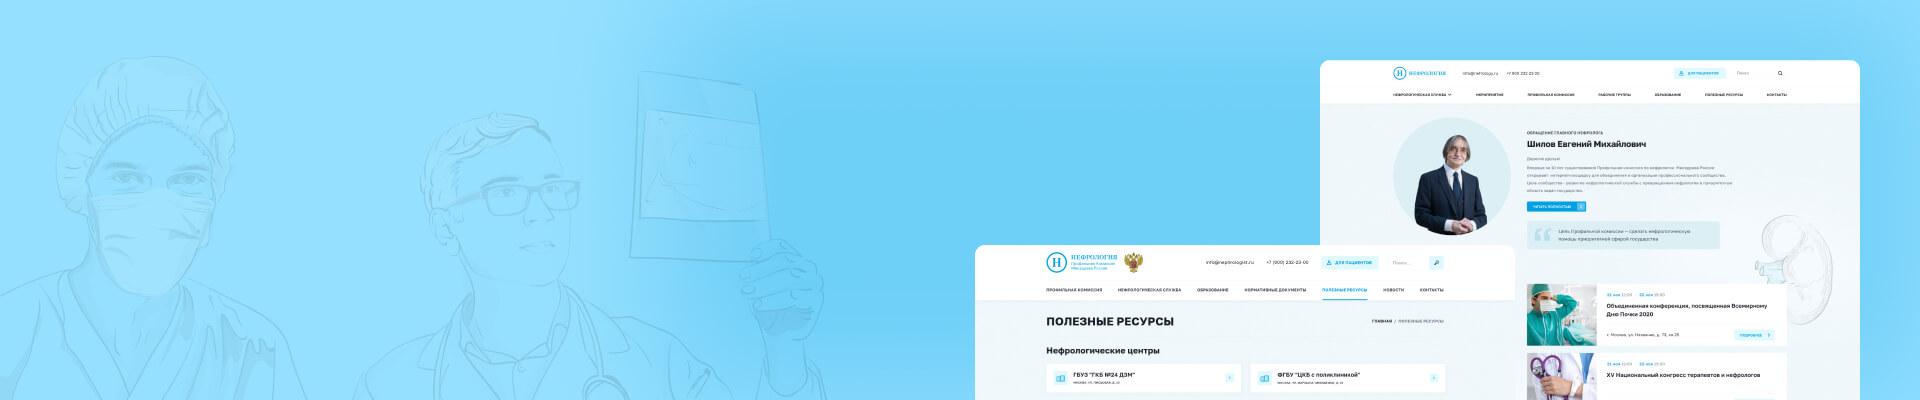 nephrologist.ru